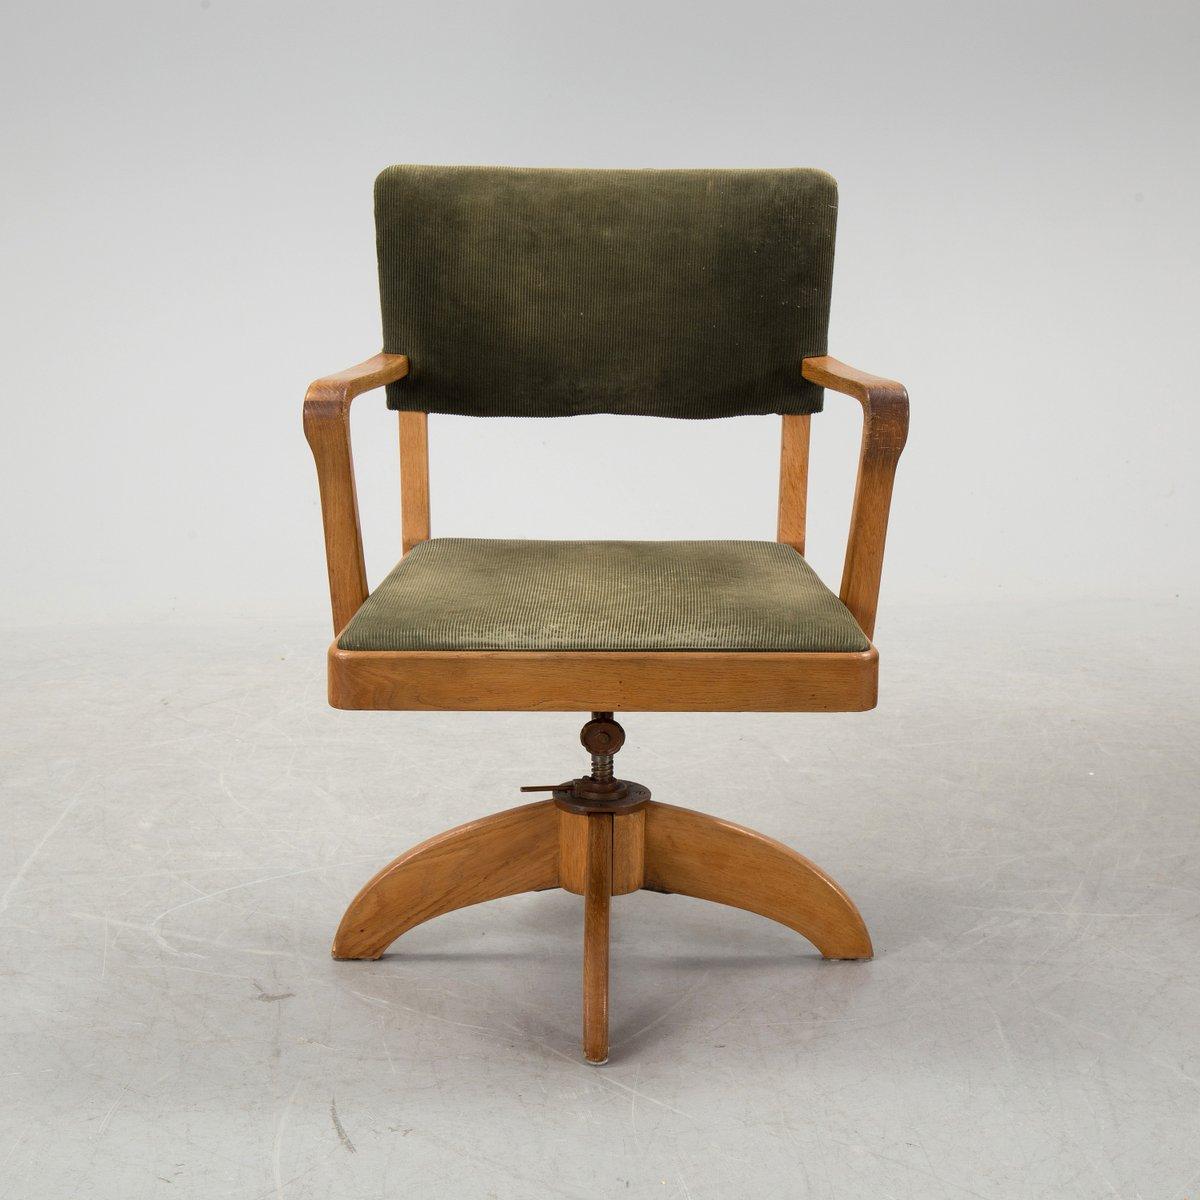 Art deco desk chairs - Swedish Art Deco Desk And Swivel Chair Set 1930s 10 7 647 00 Price Per Set